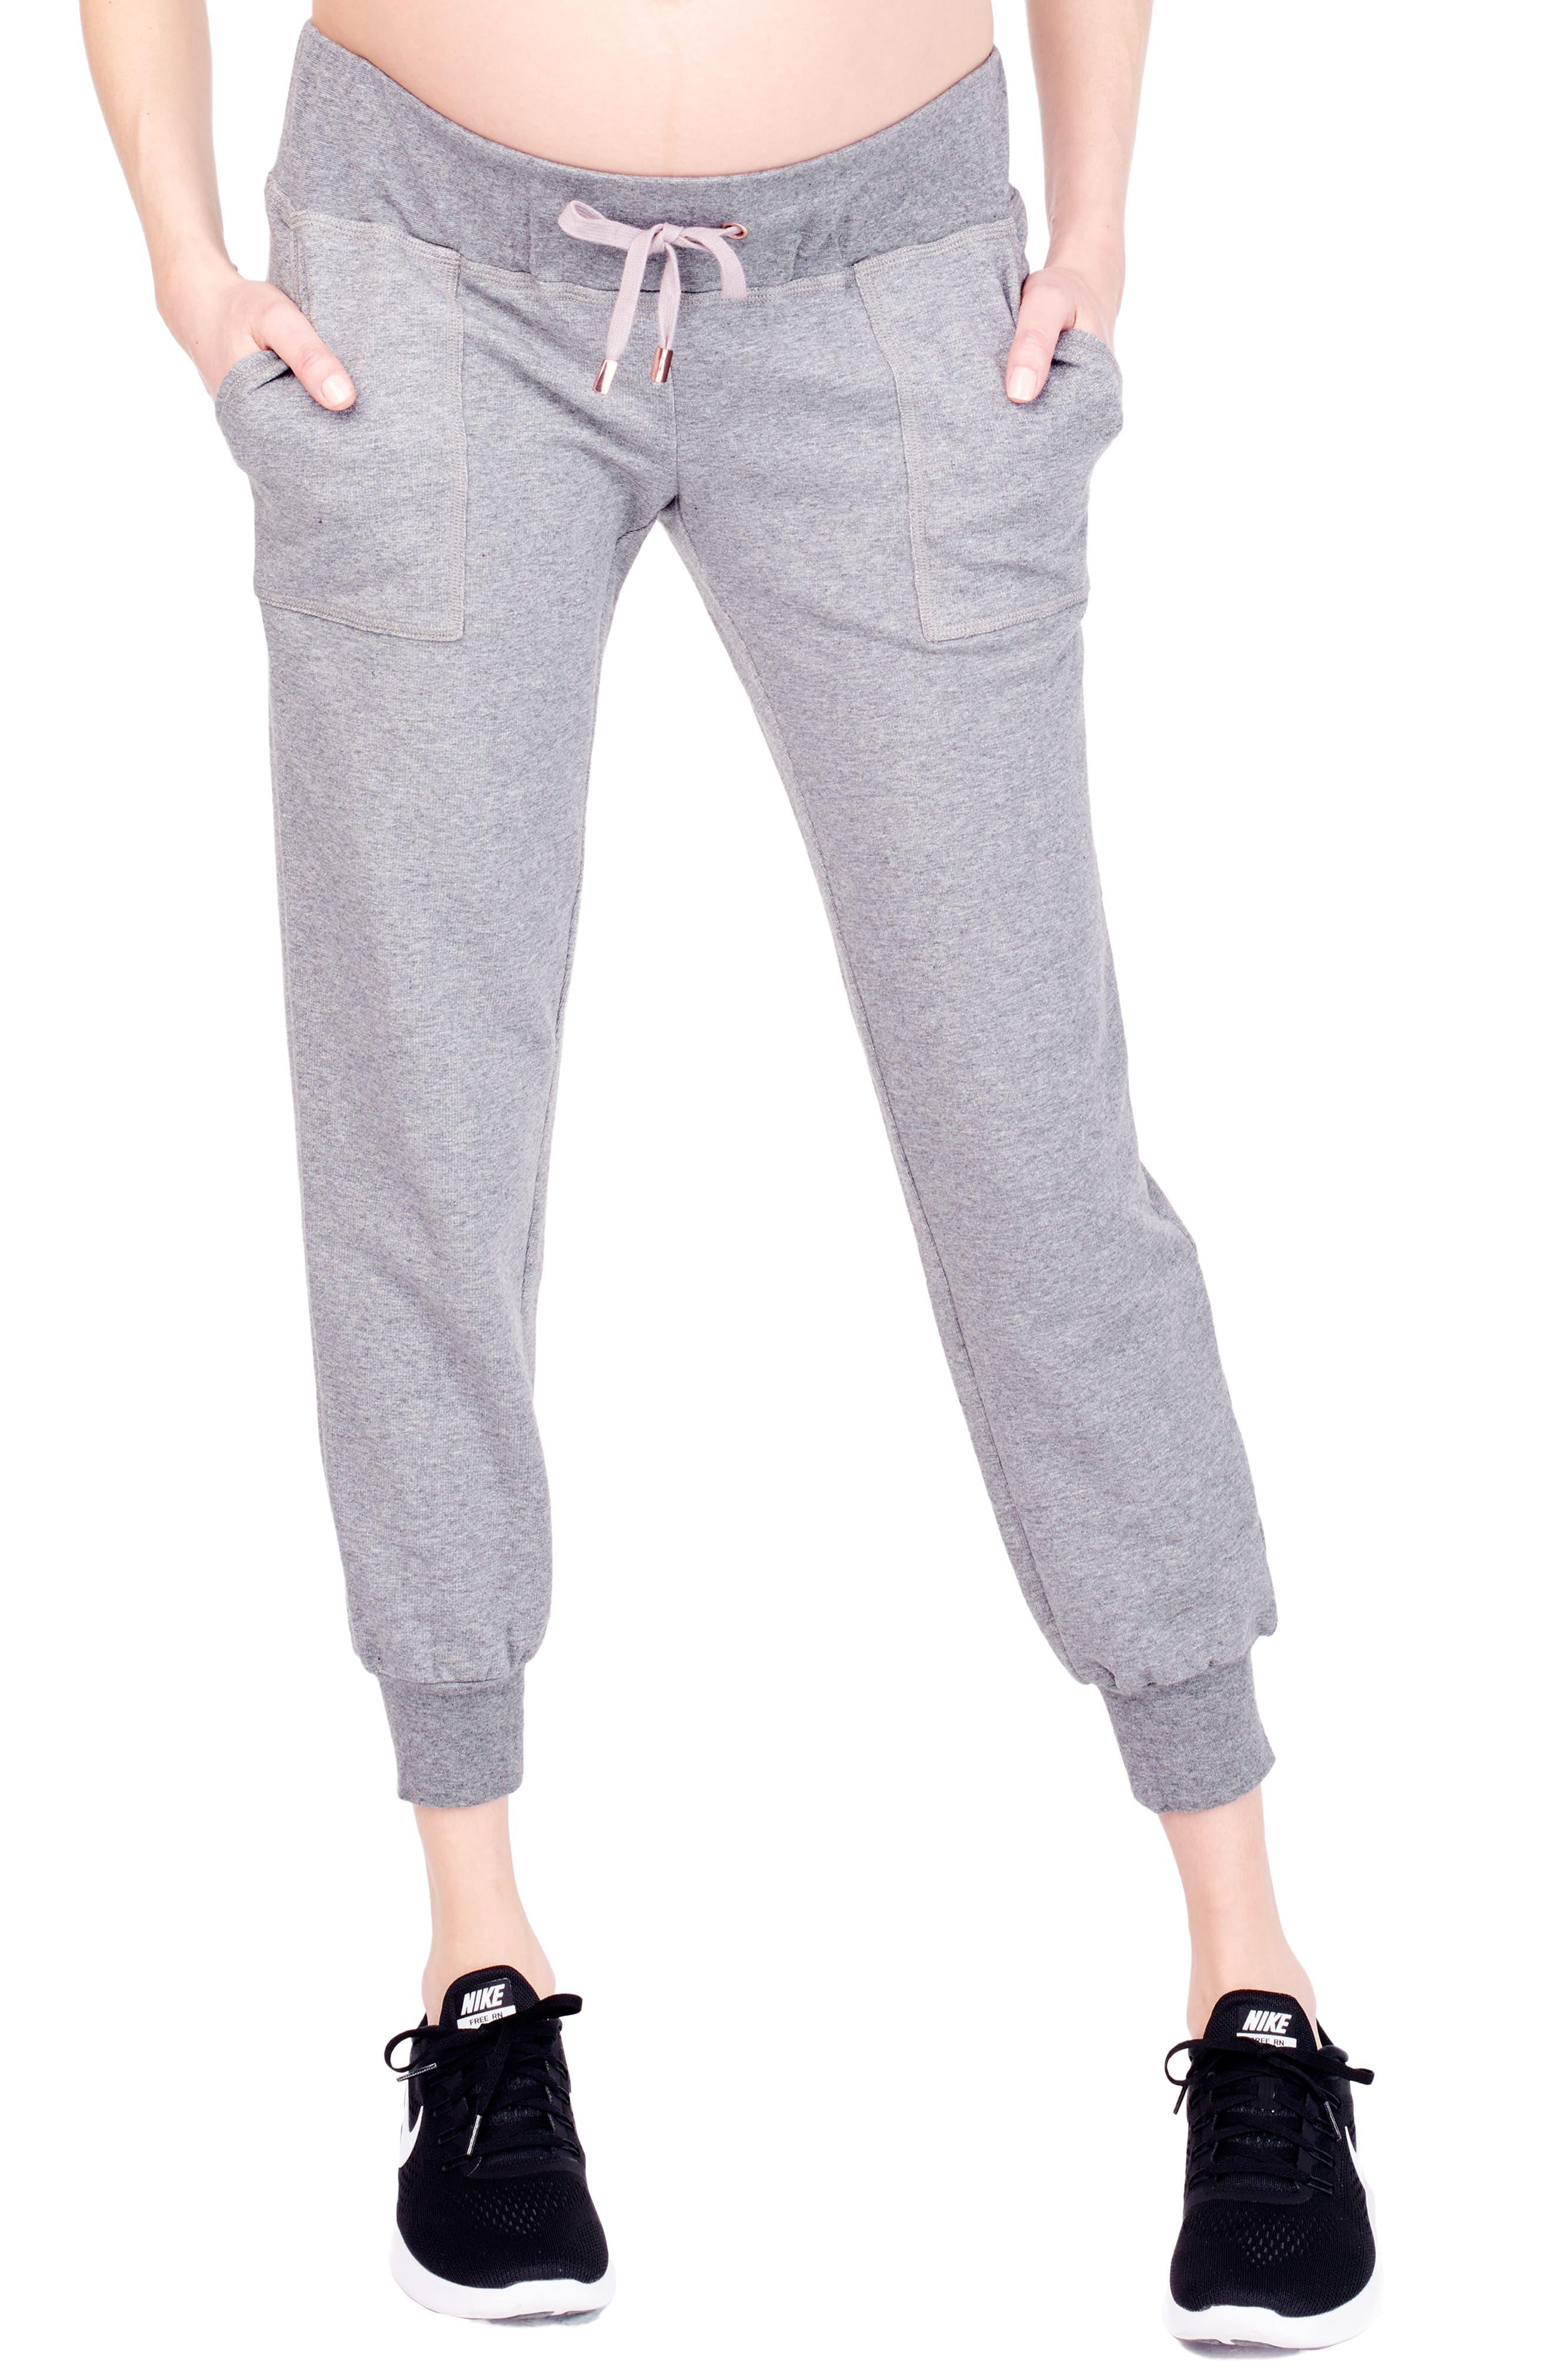 Cozy Fleece Maternity Jogger Pants,                             Main thumbnail 1, color,                             Medium Grey Heather